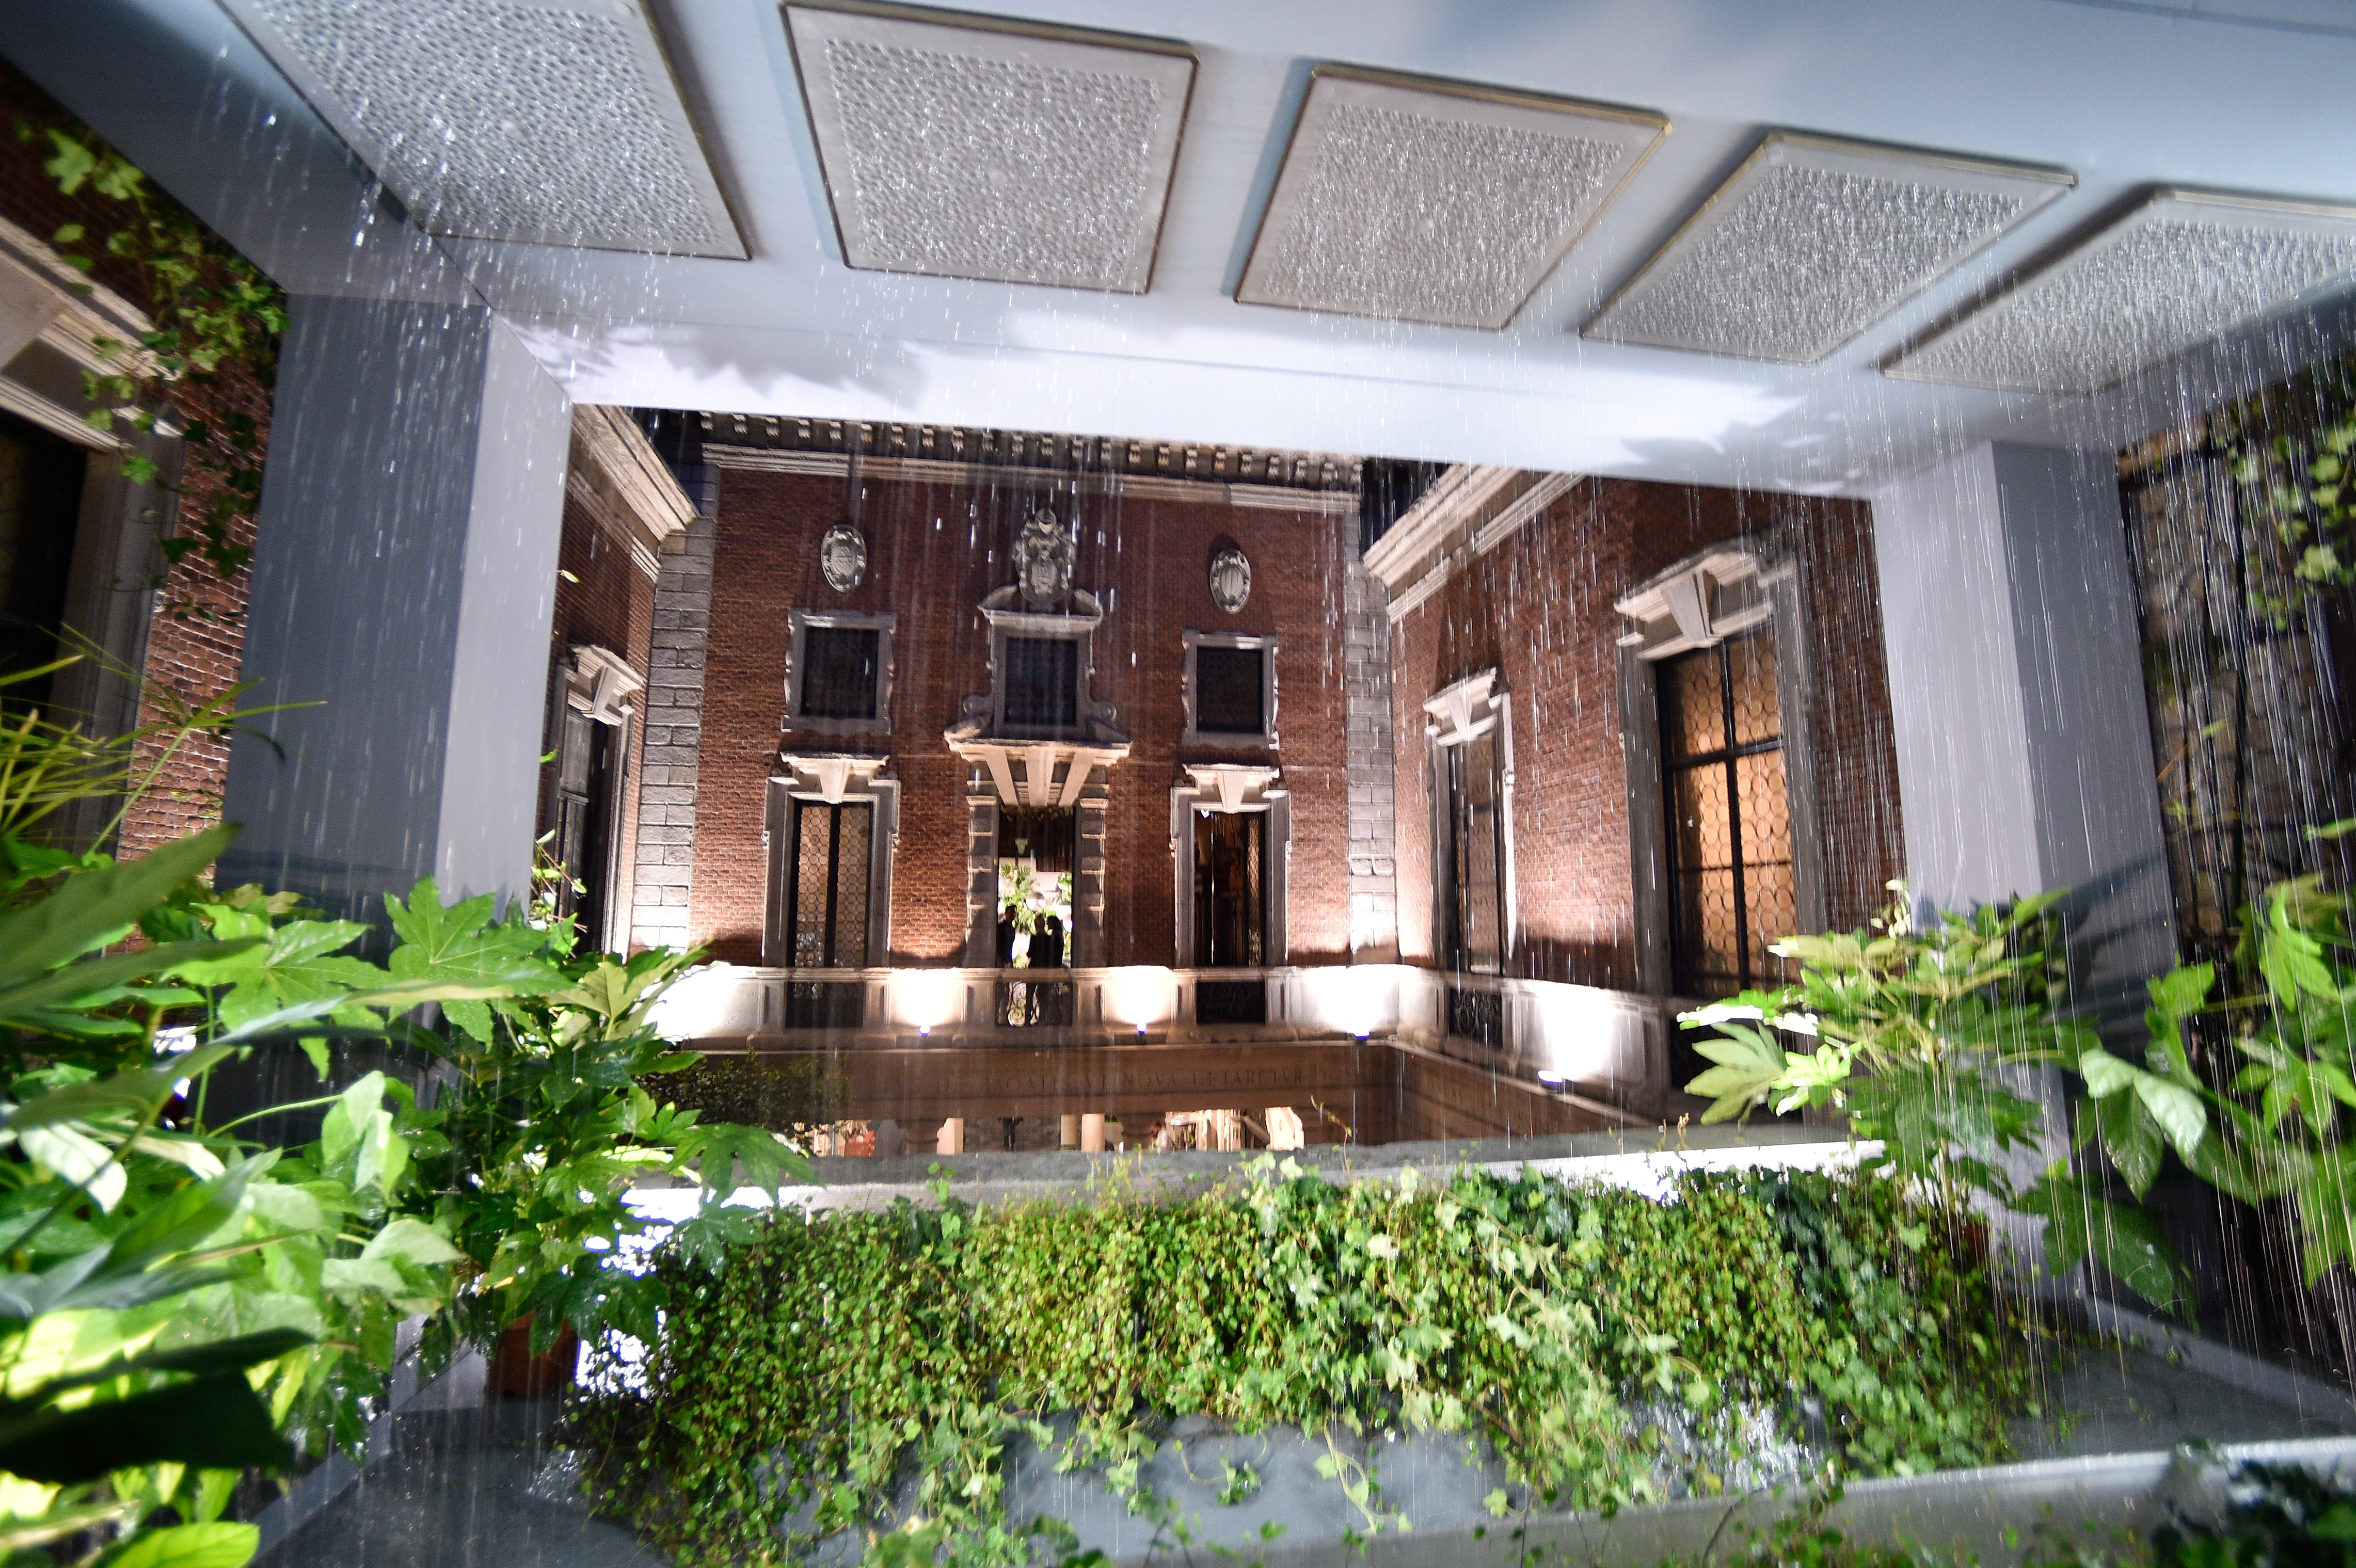 Kohler Presents Real Rain During Milan Design Week Business Wire - Real home design